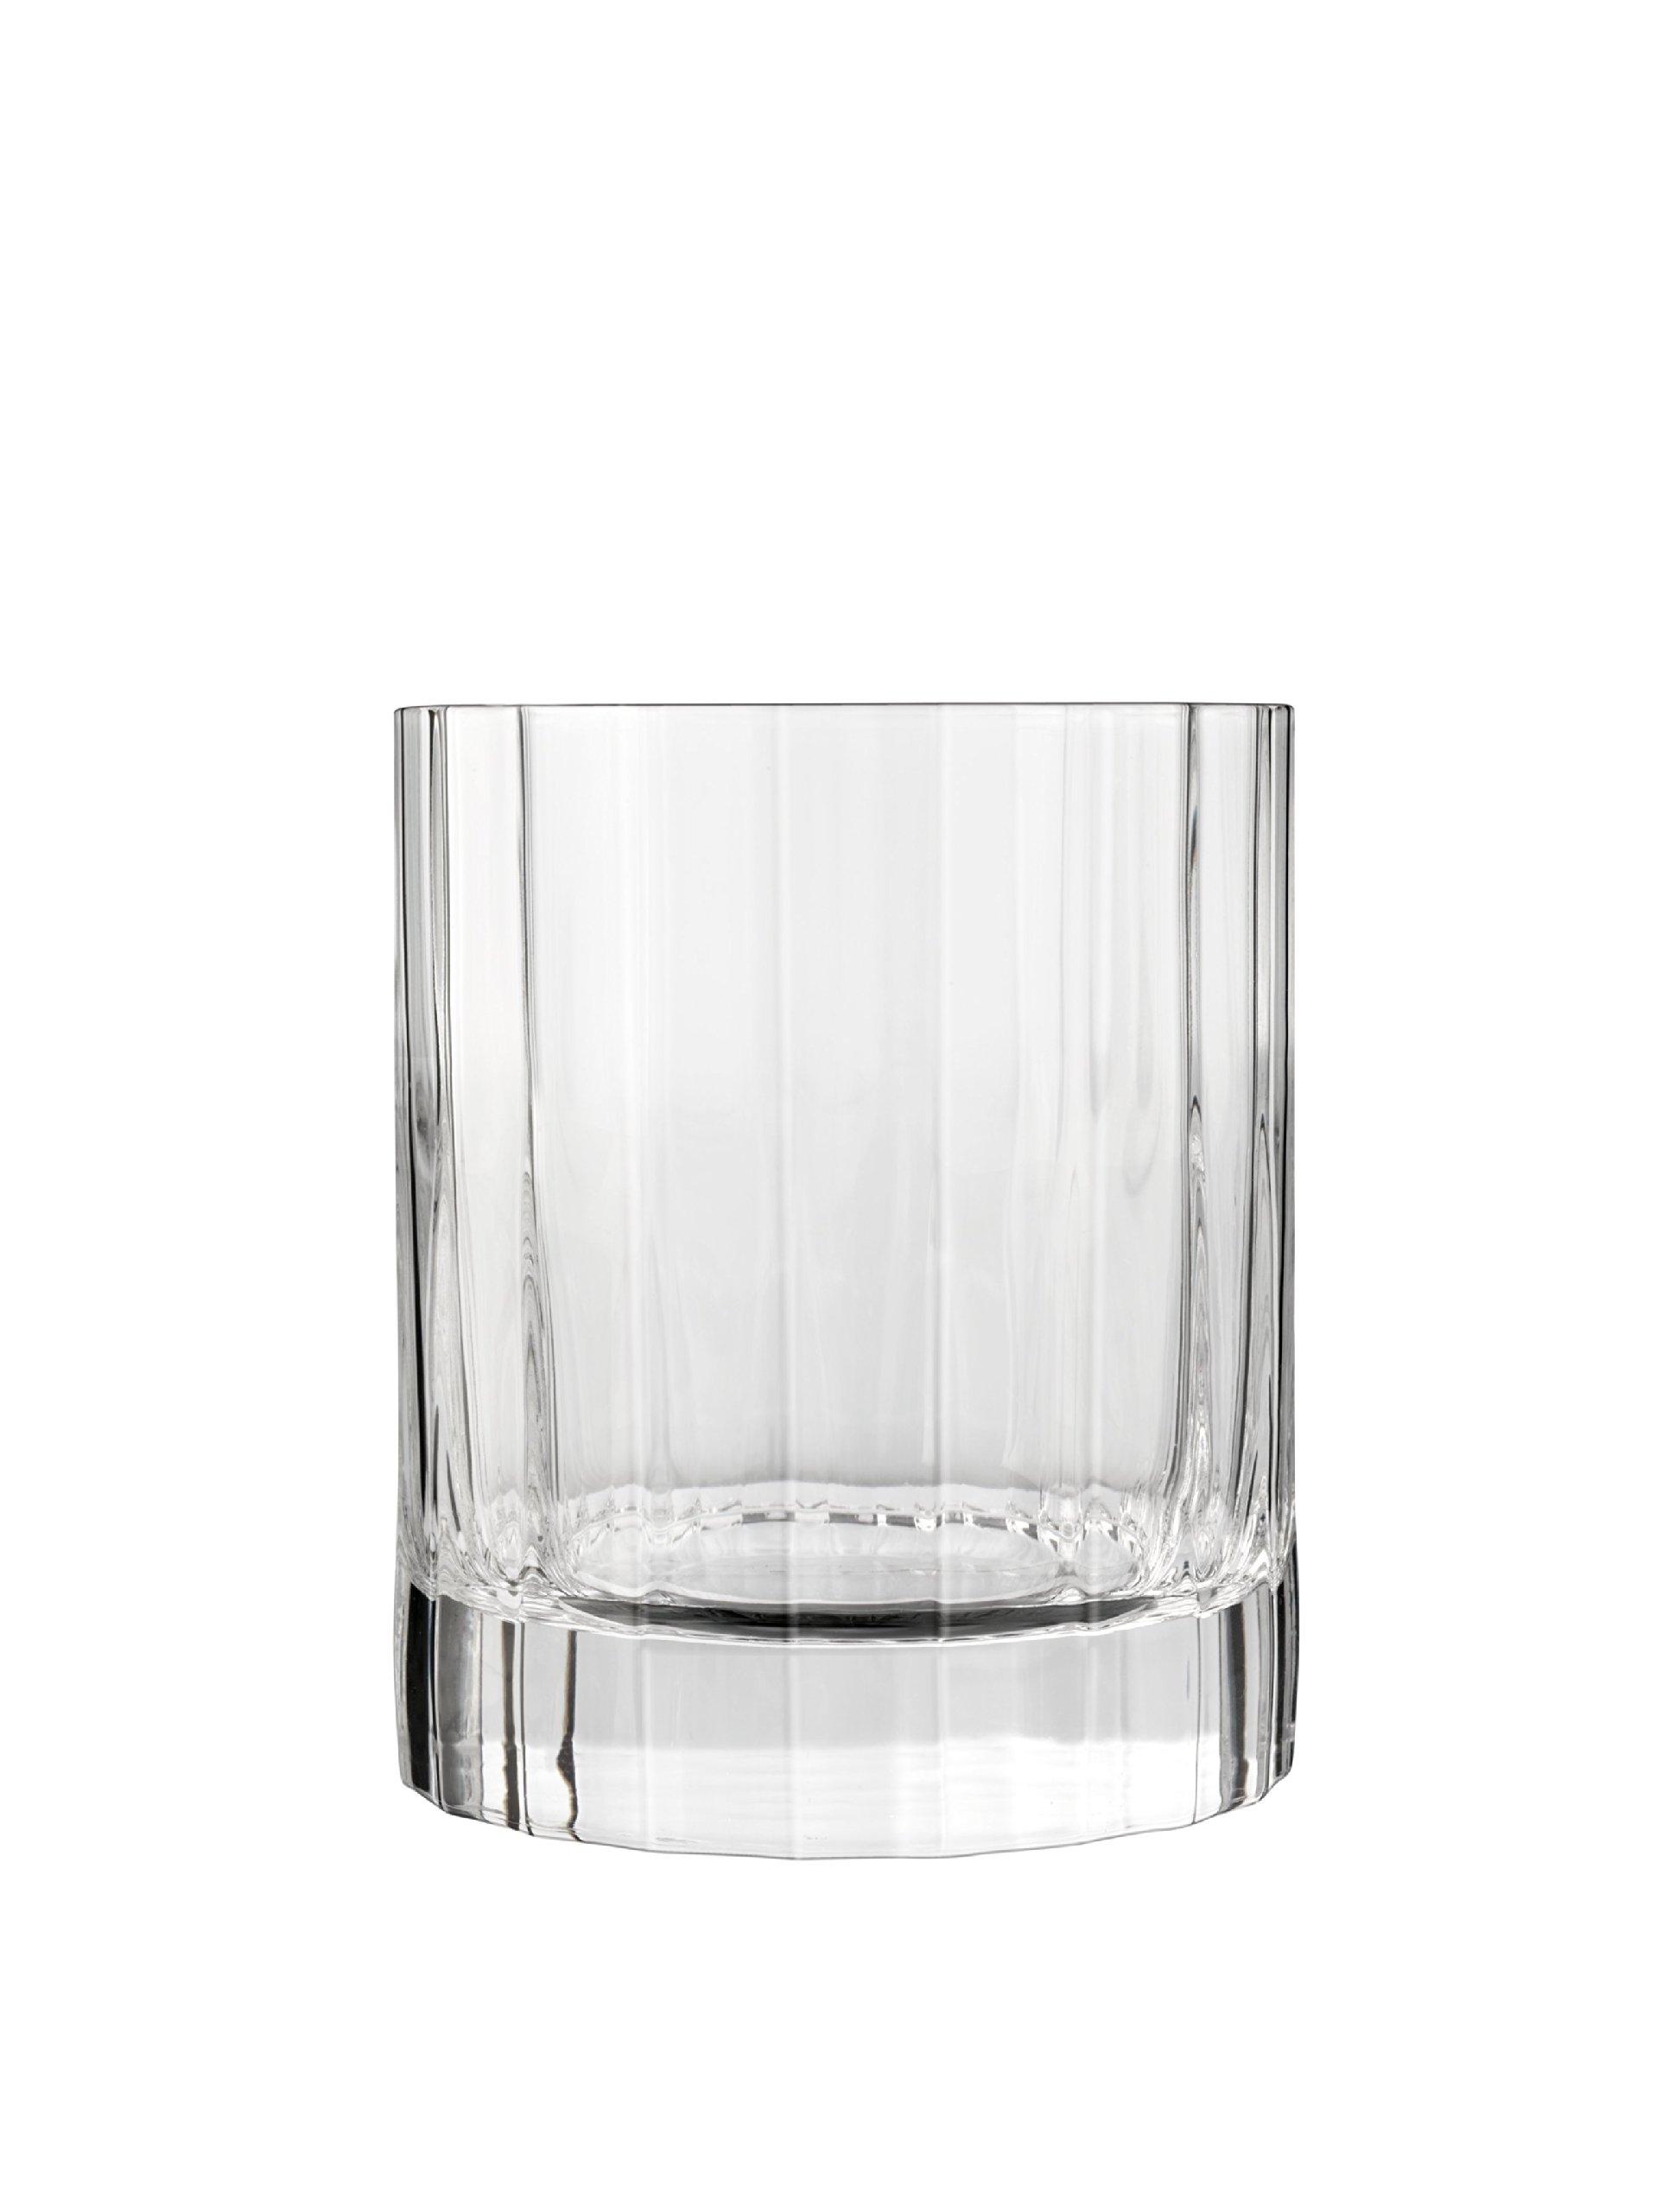 Luigi Bormioli 10823/01 Bach 11.25 oz Double Old Fashioned Glasses Set of 6 Clear